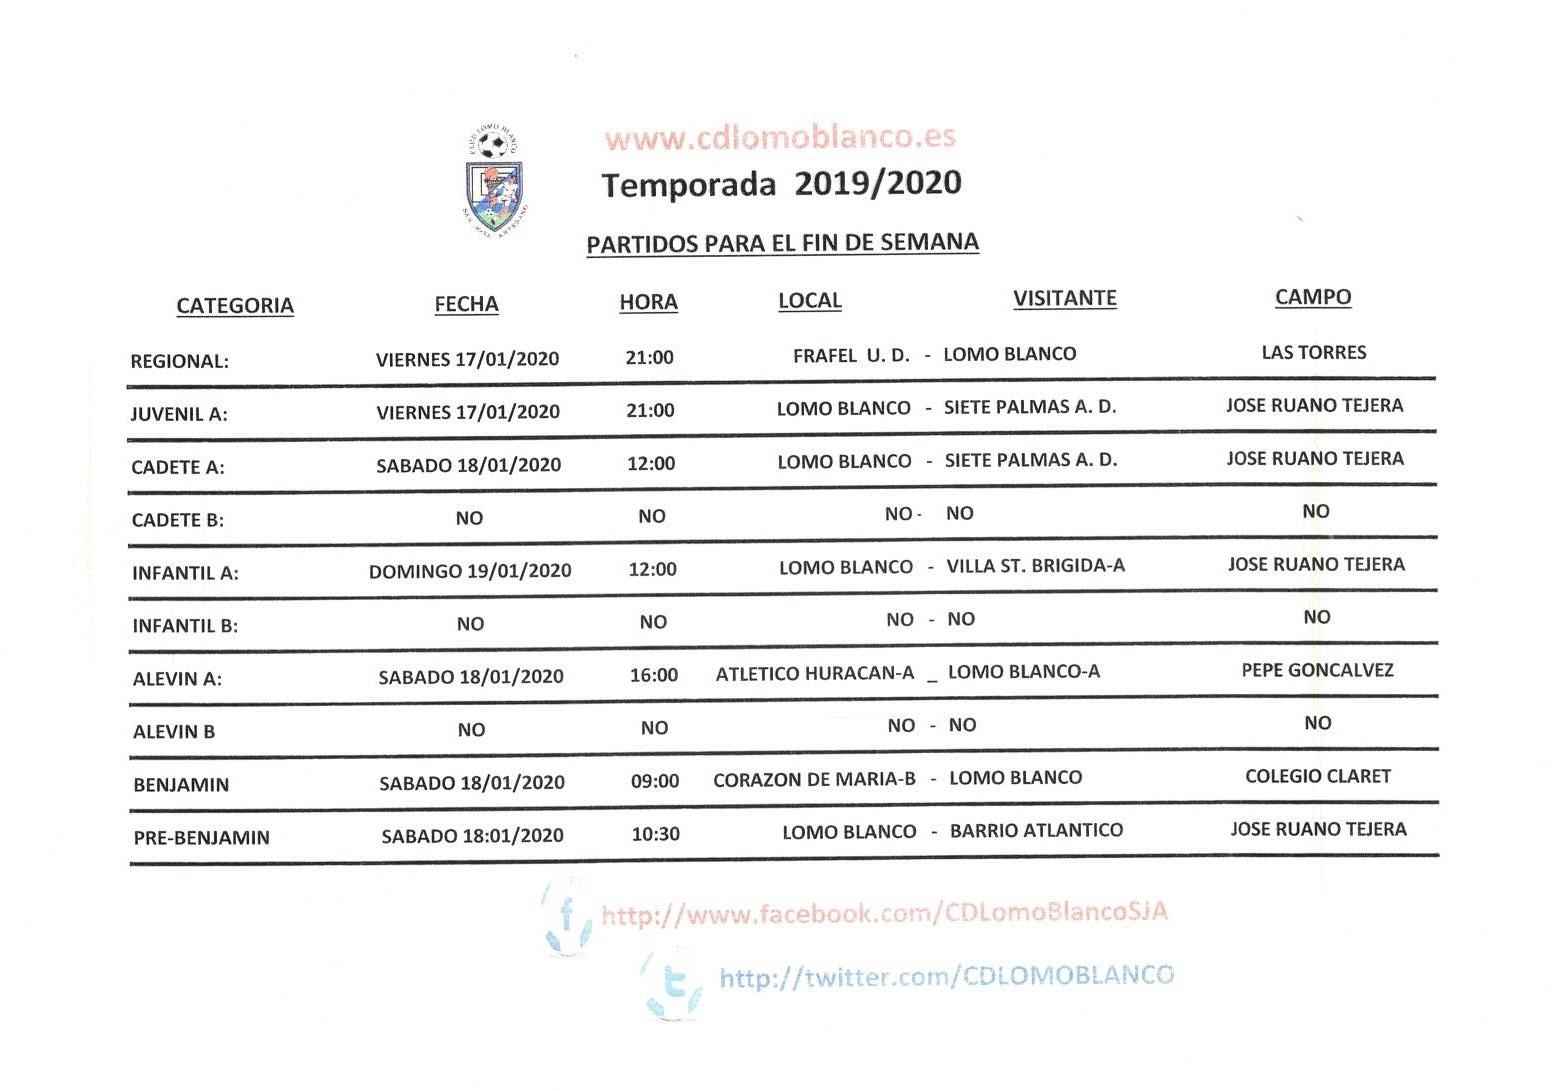 PARTIDOS DEL FIN DE SEMANA 17-19 DE DICIEMBRE